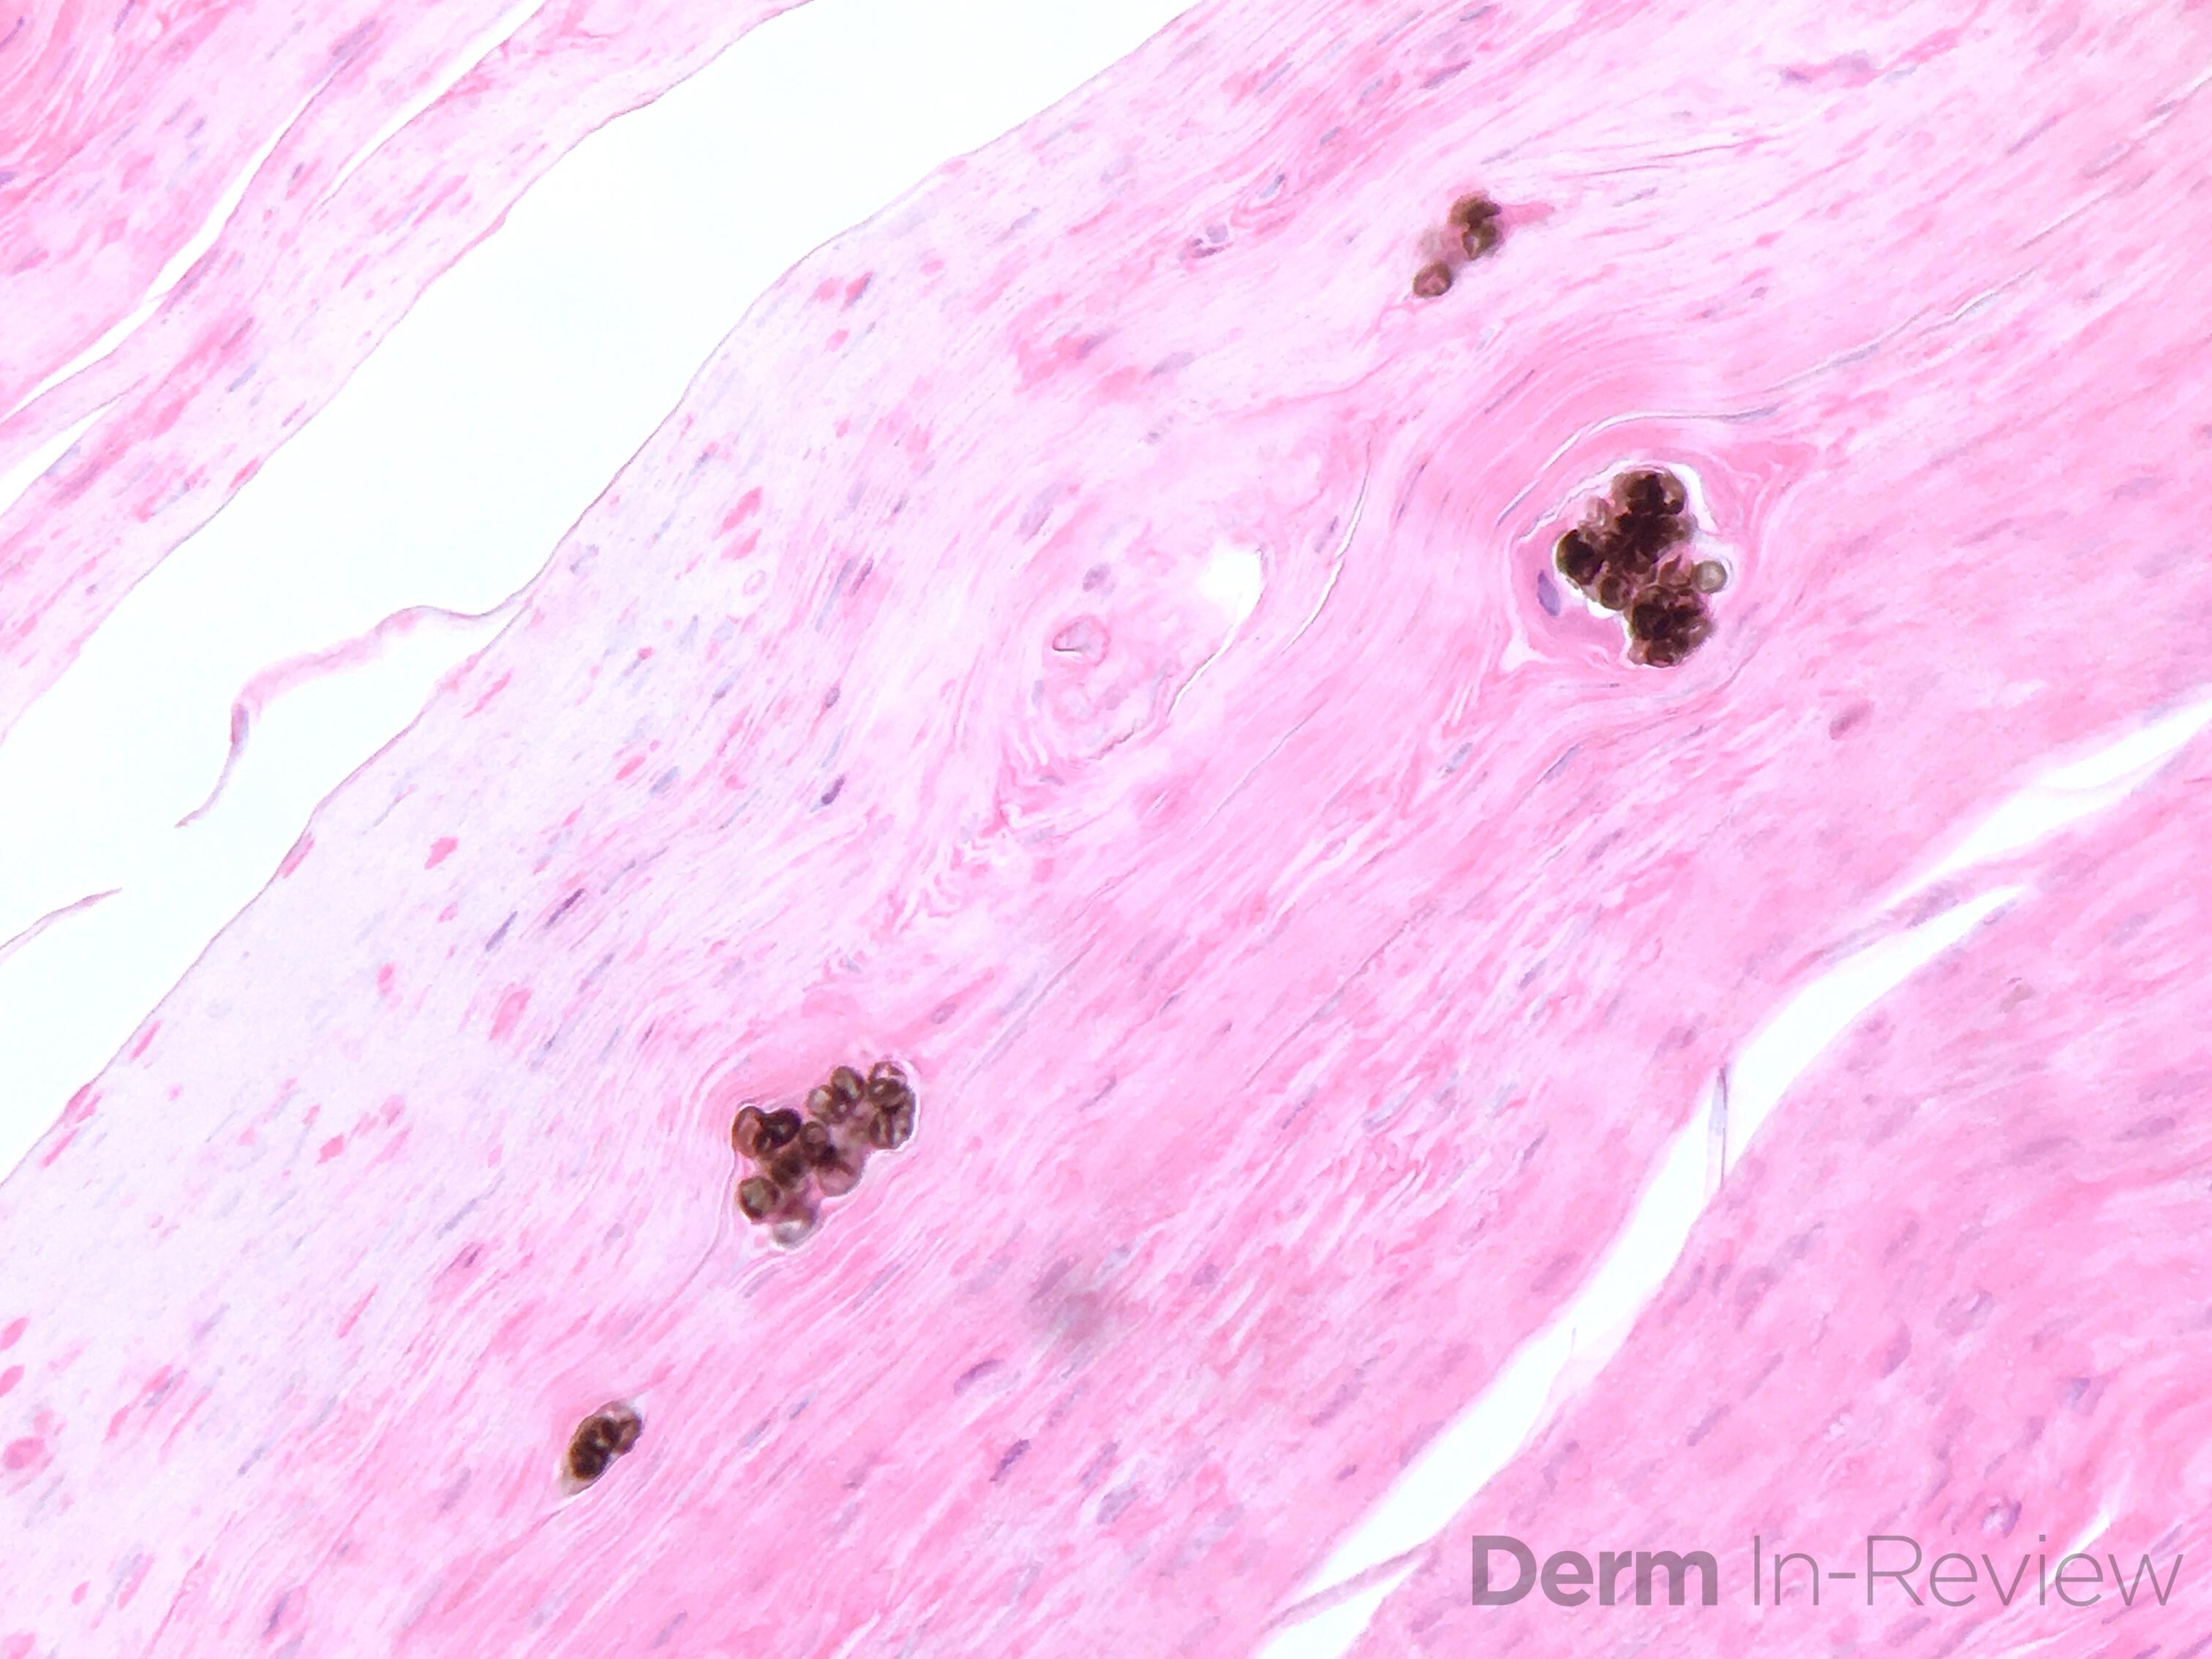 8.13 Chromoblastomycosis